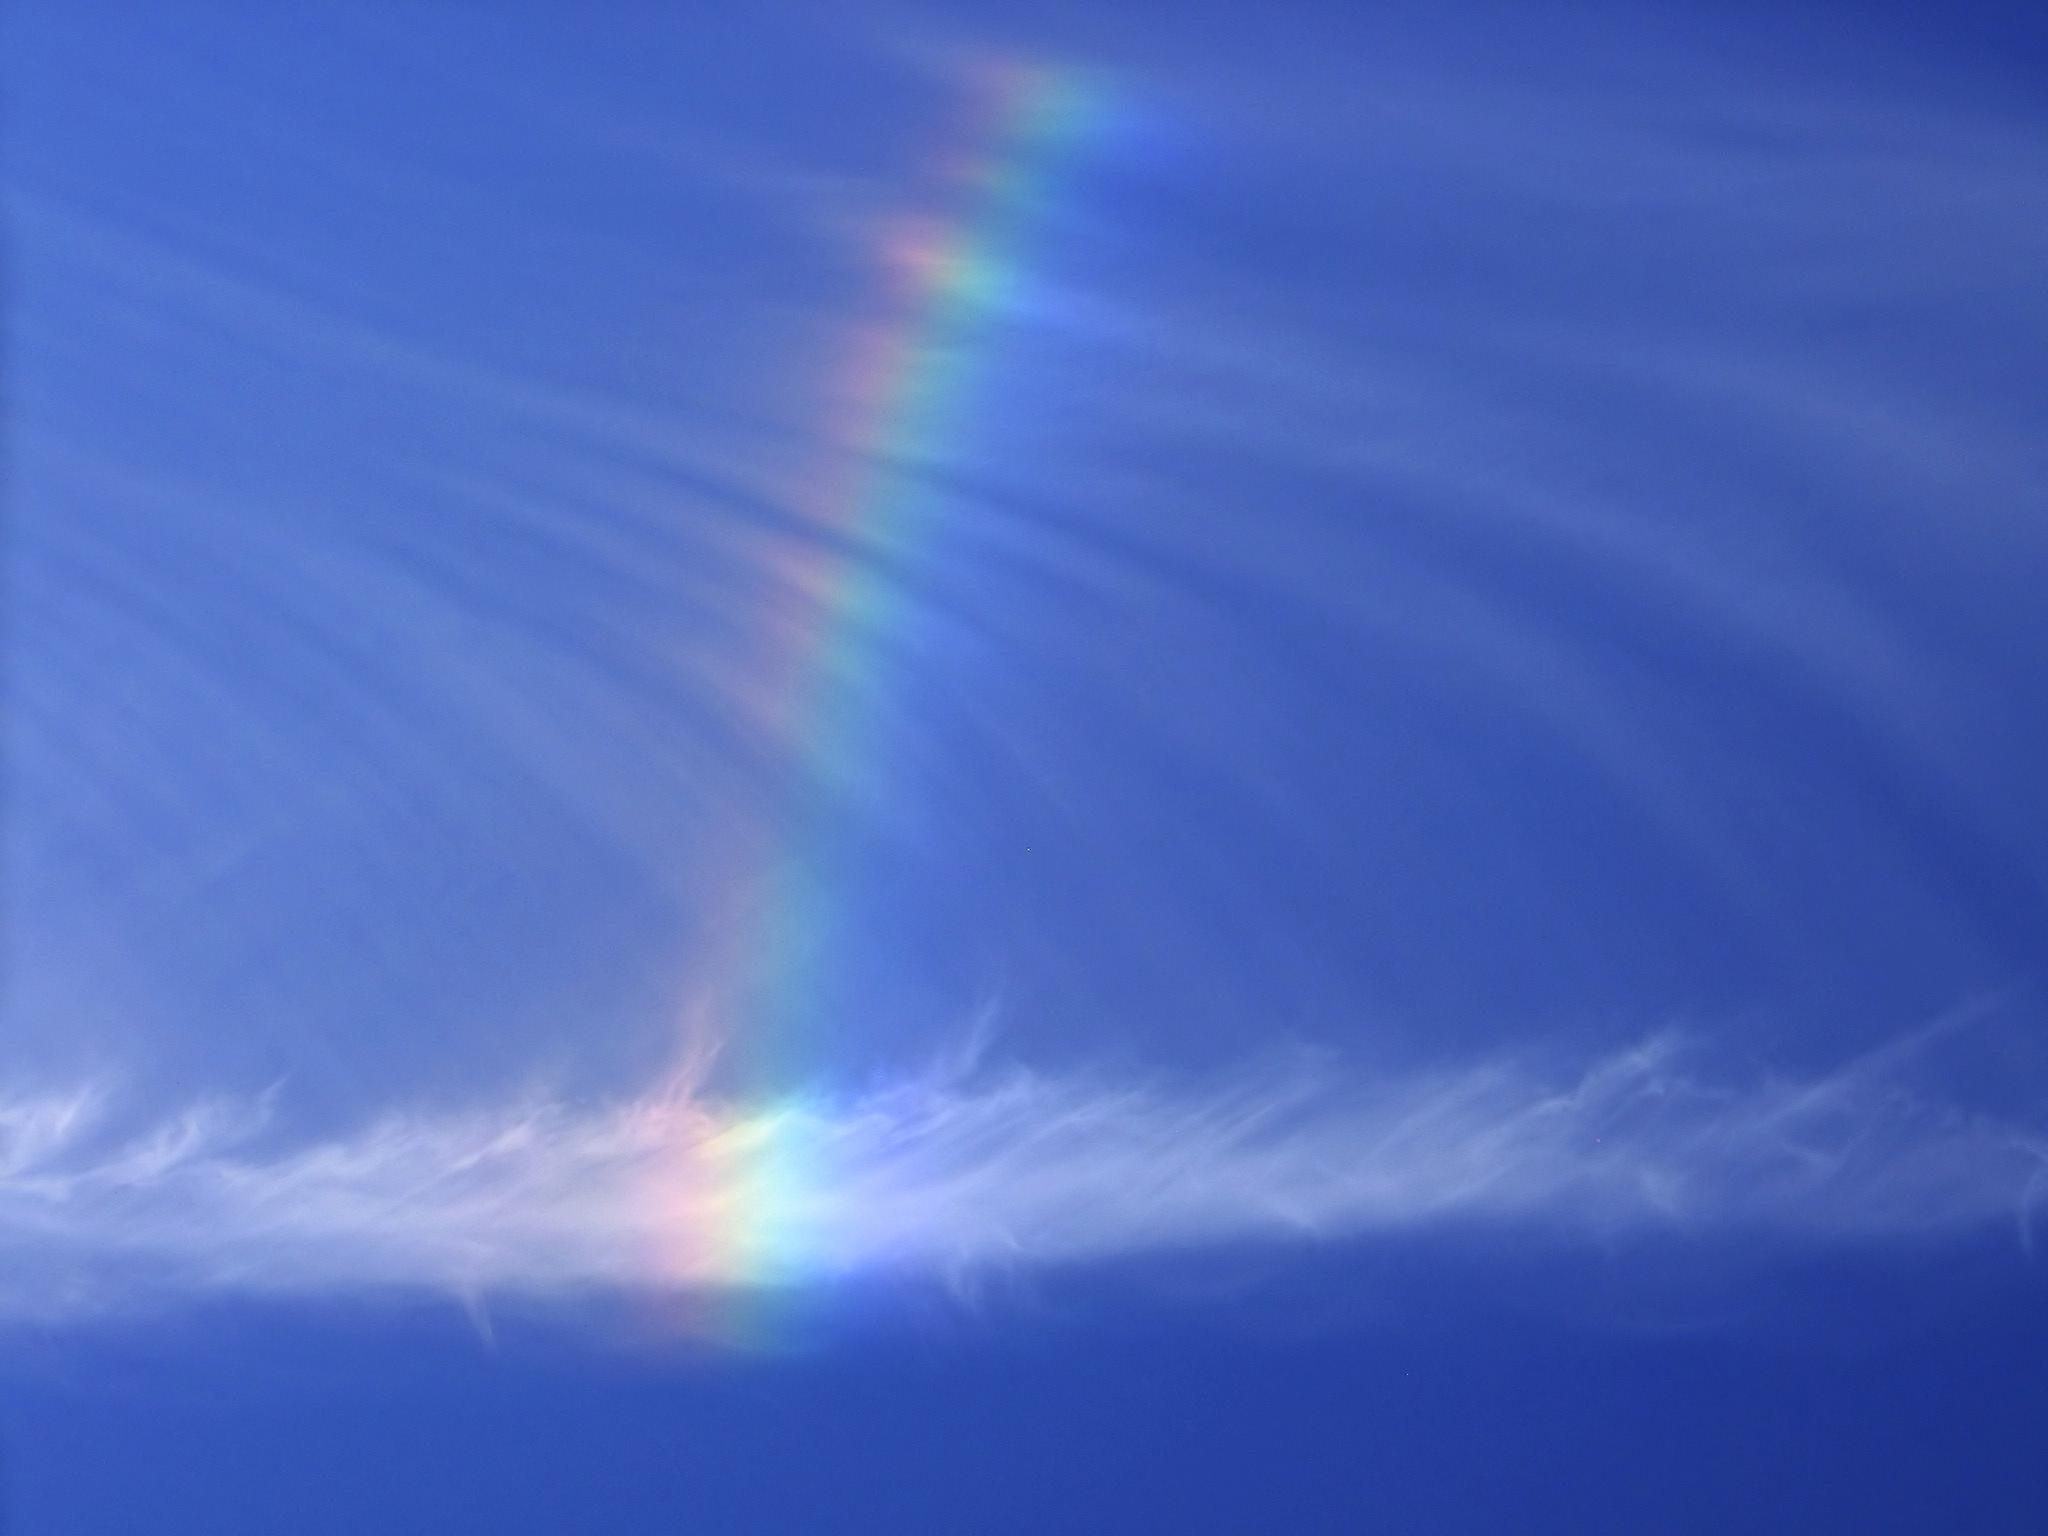 rainbows by s sharonlu sheridan osf peace u0026 good